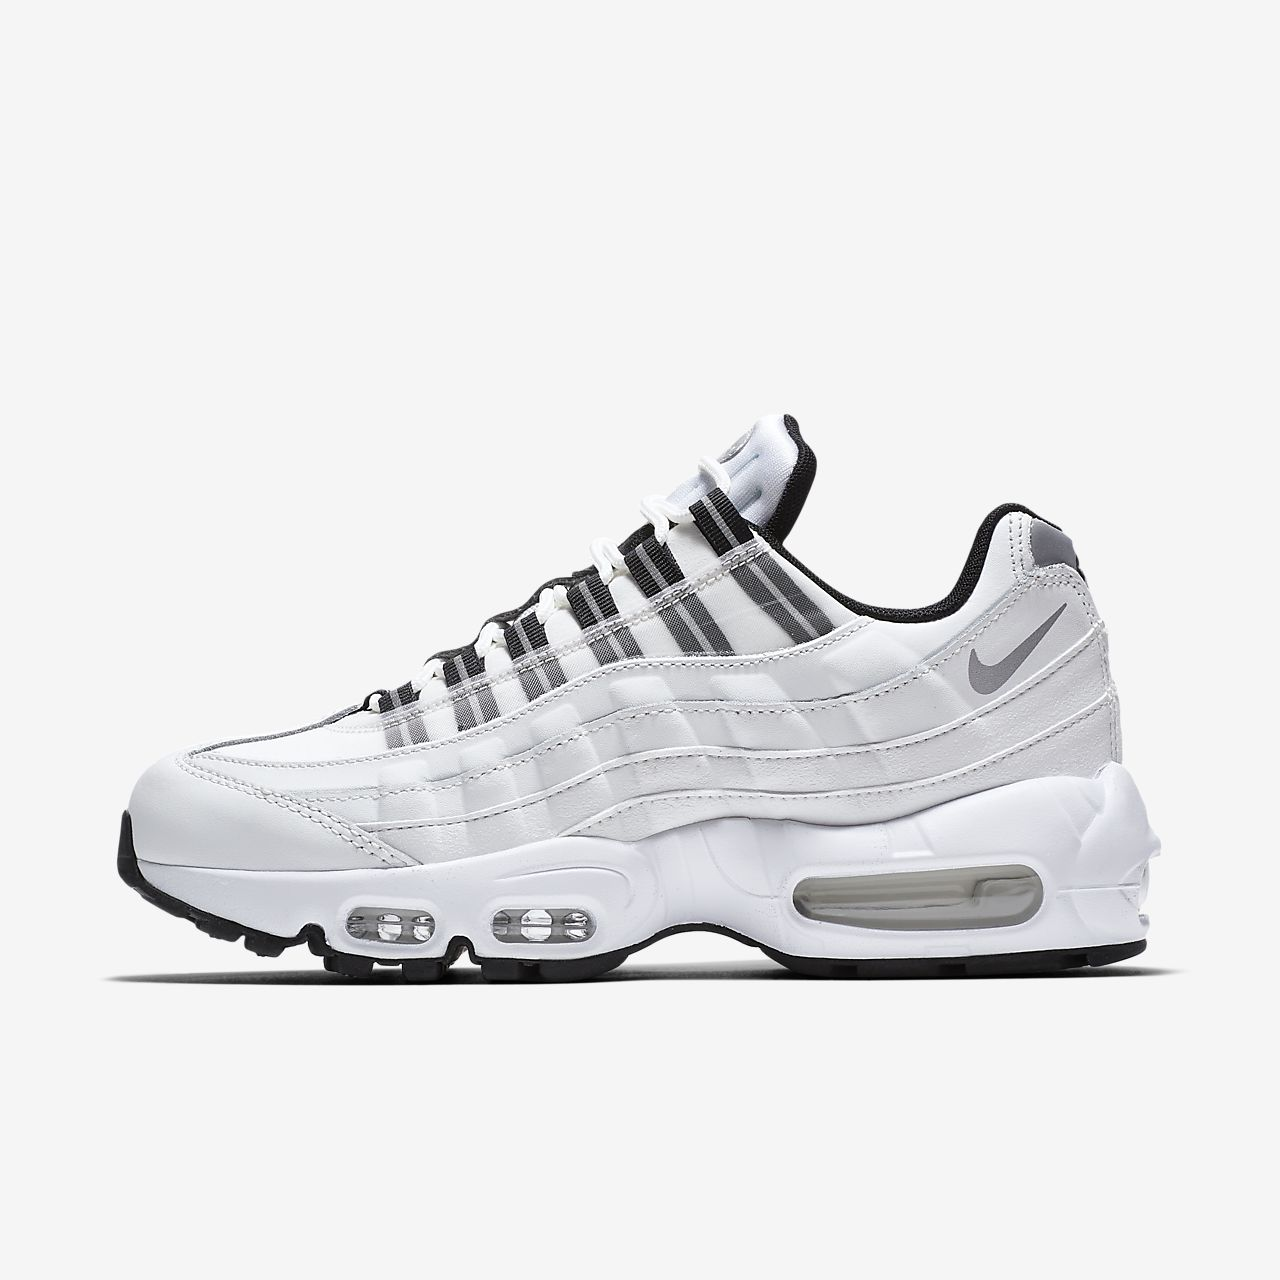 0b91a7f6b9c8 Nike Air Max 95 Women s Shoe. Nike.com LU